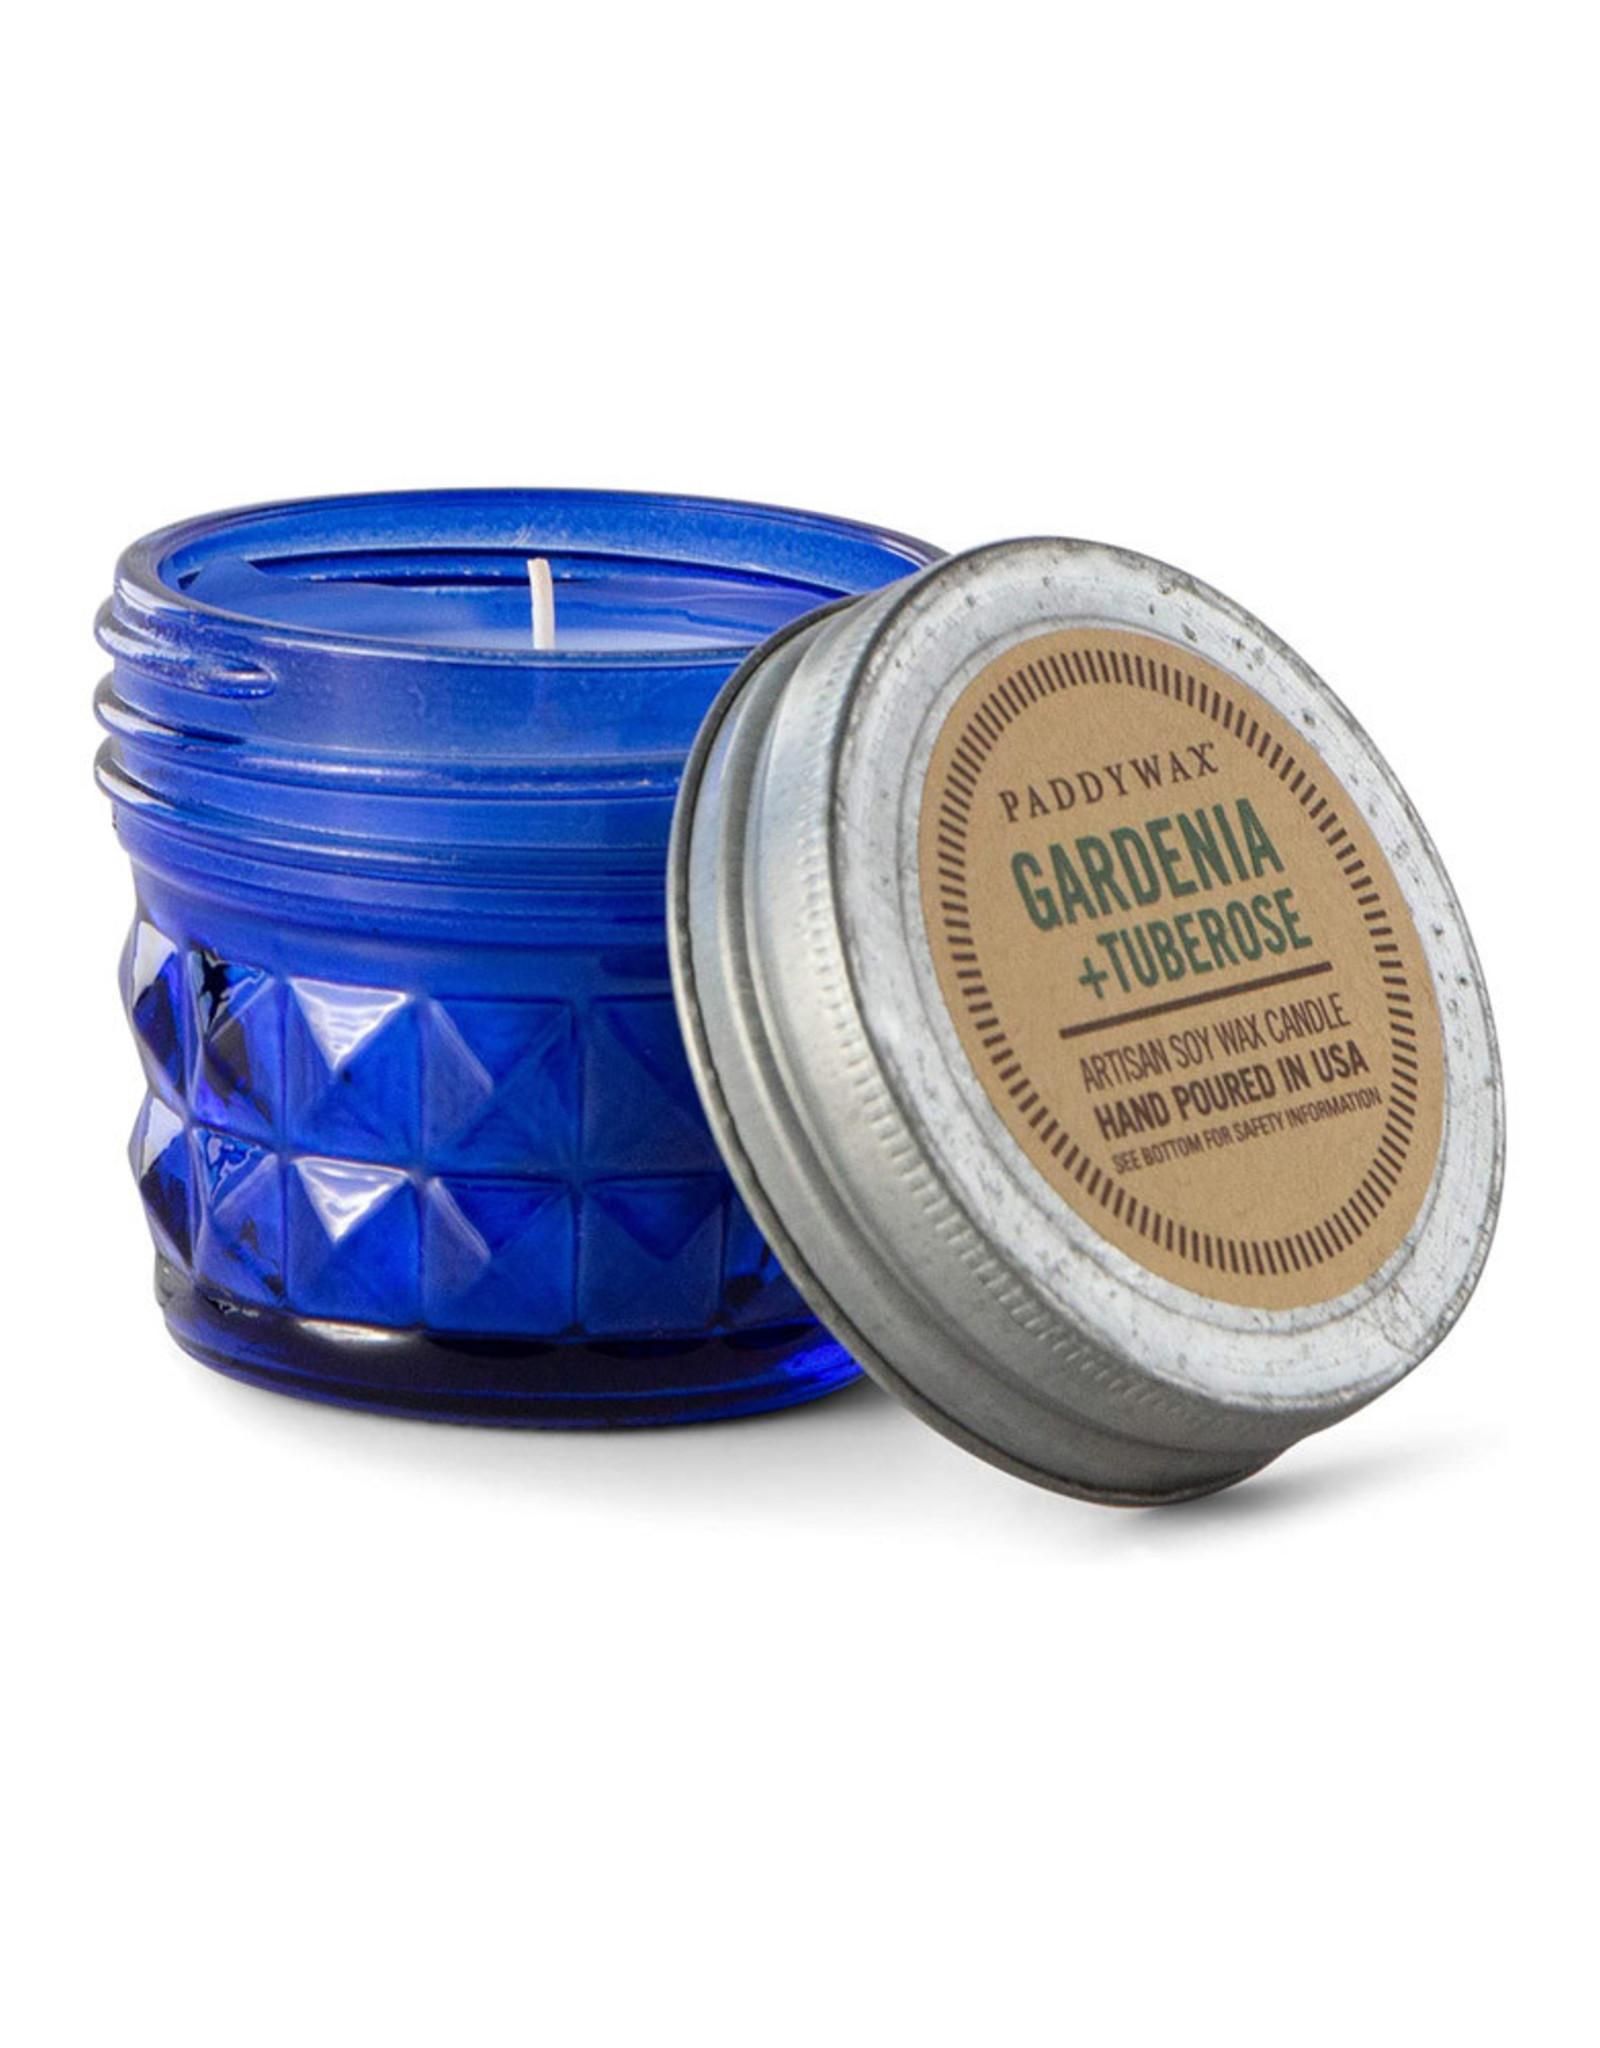 Paddywax Relish Jar 3 oz candle - Gardenia & Tuberose